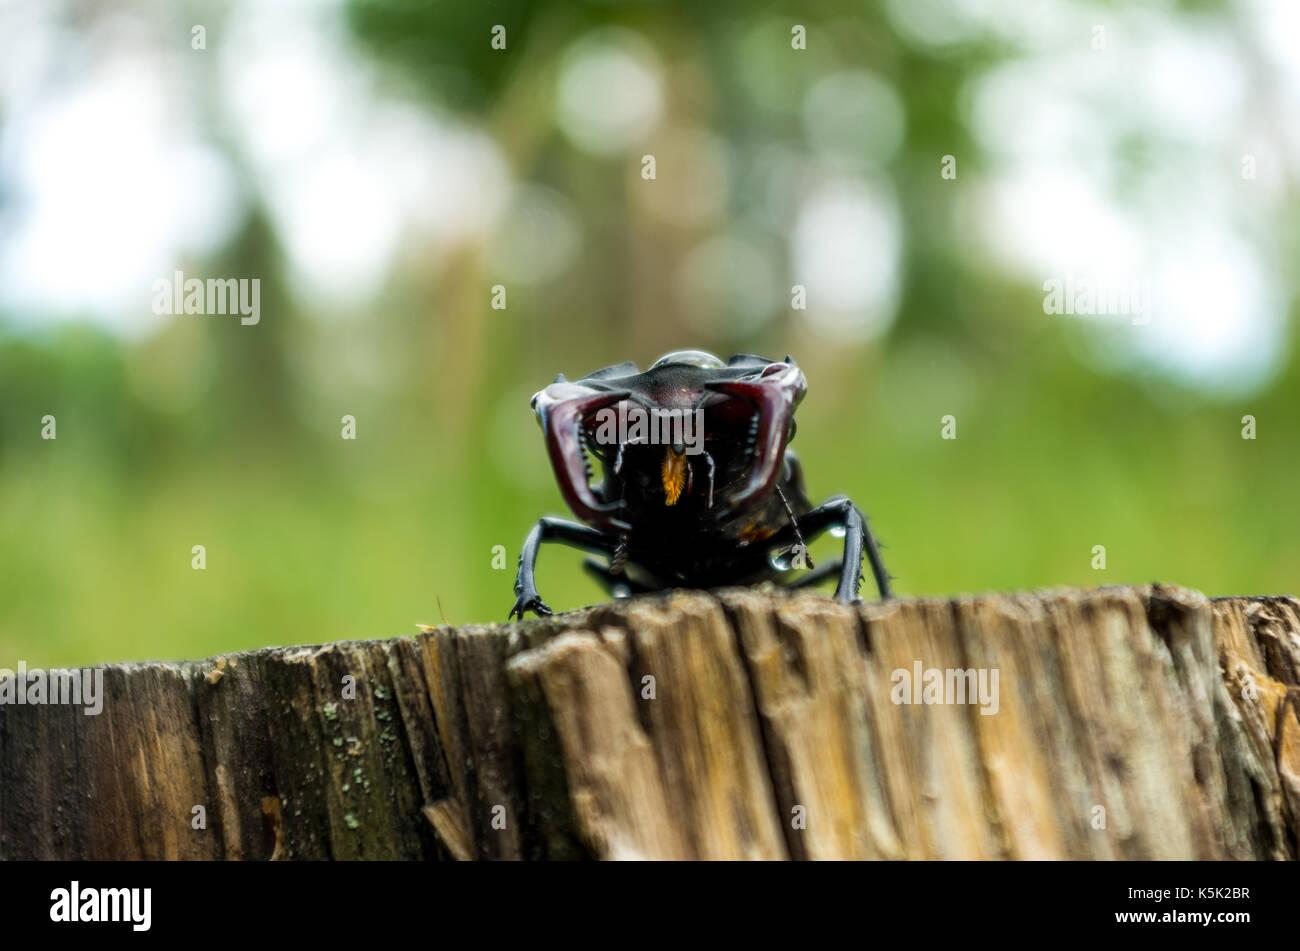 Endangered species of rosacea beetles. Lucanus cervus in nature. - Stock Image